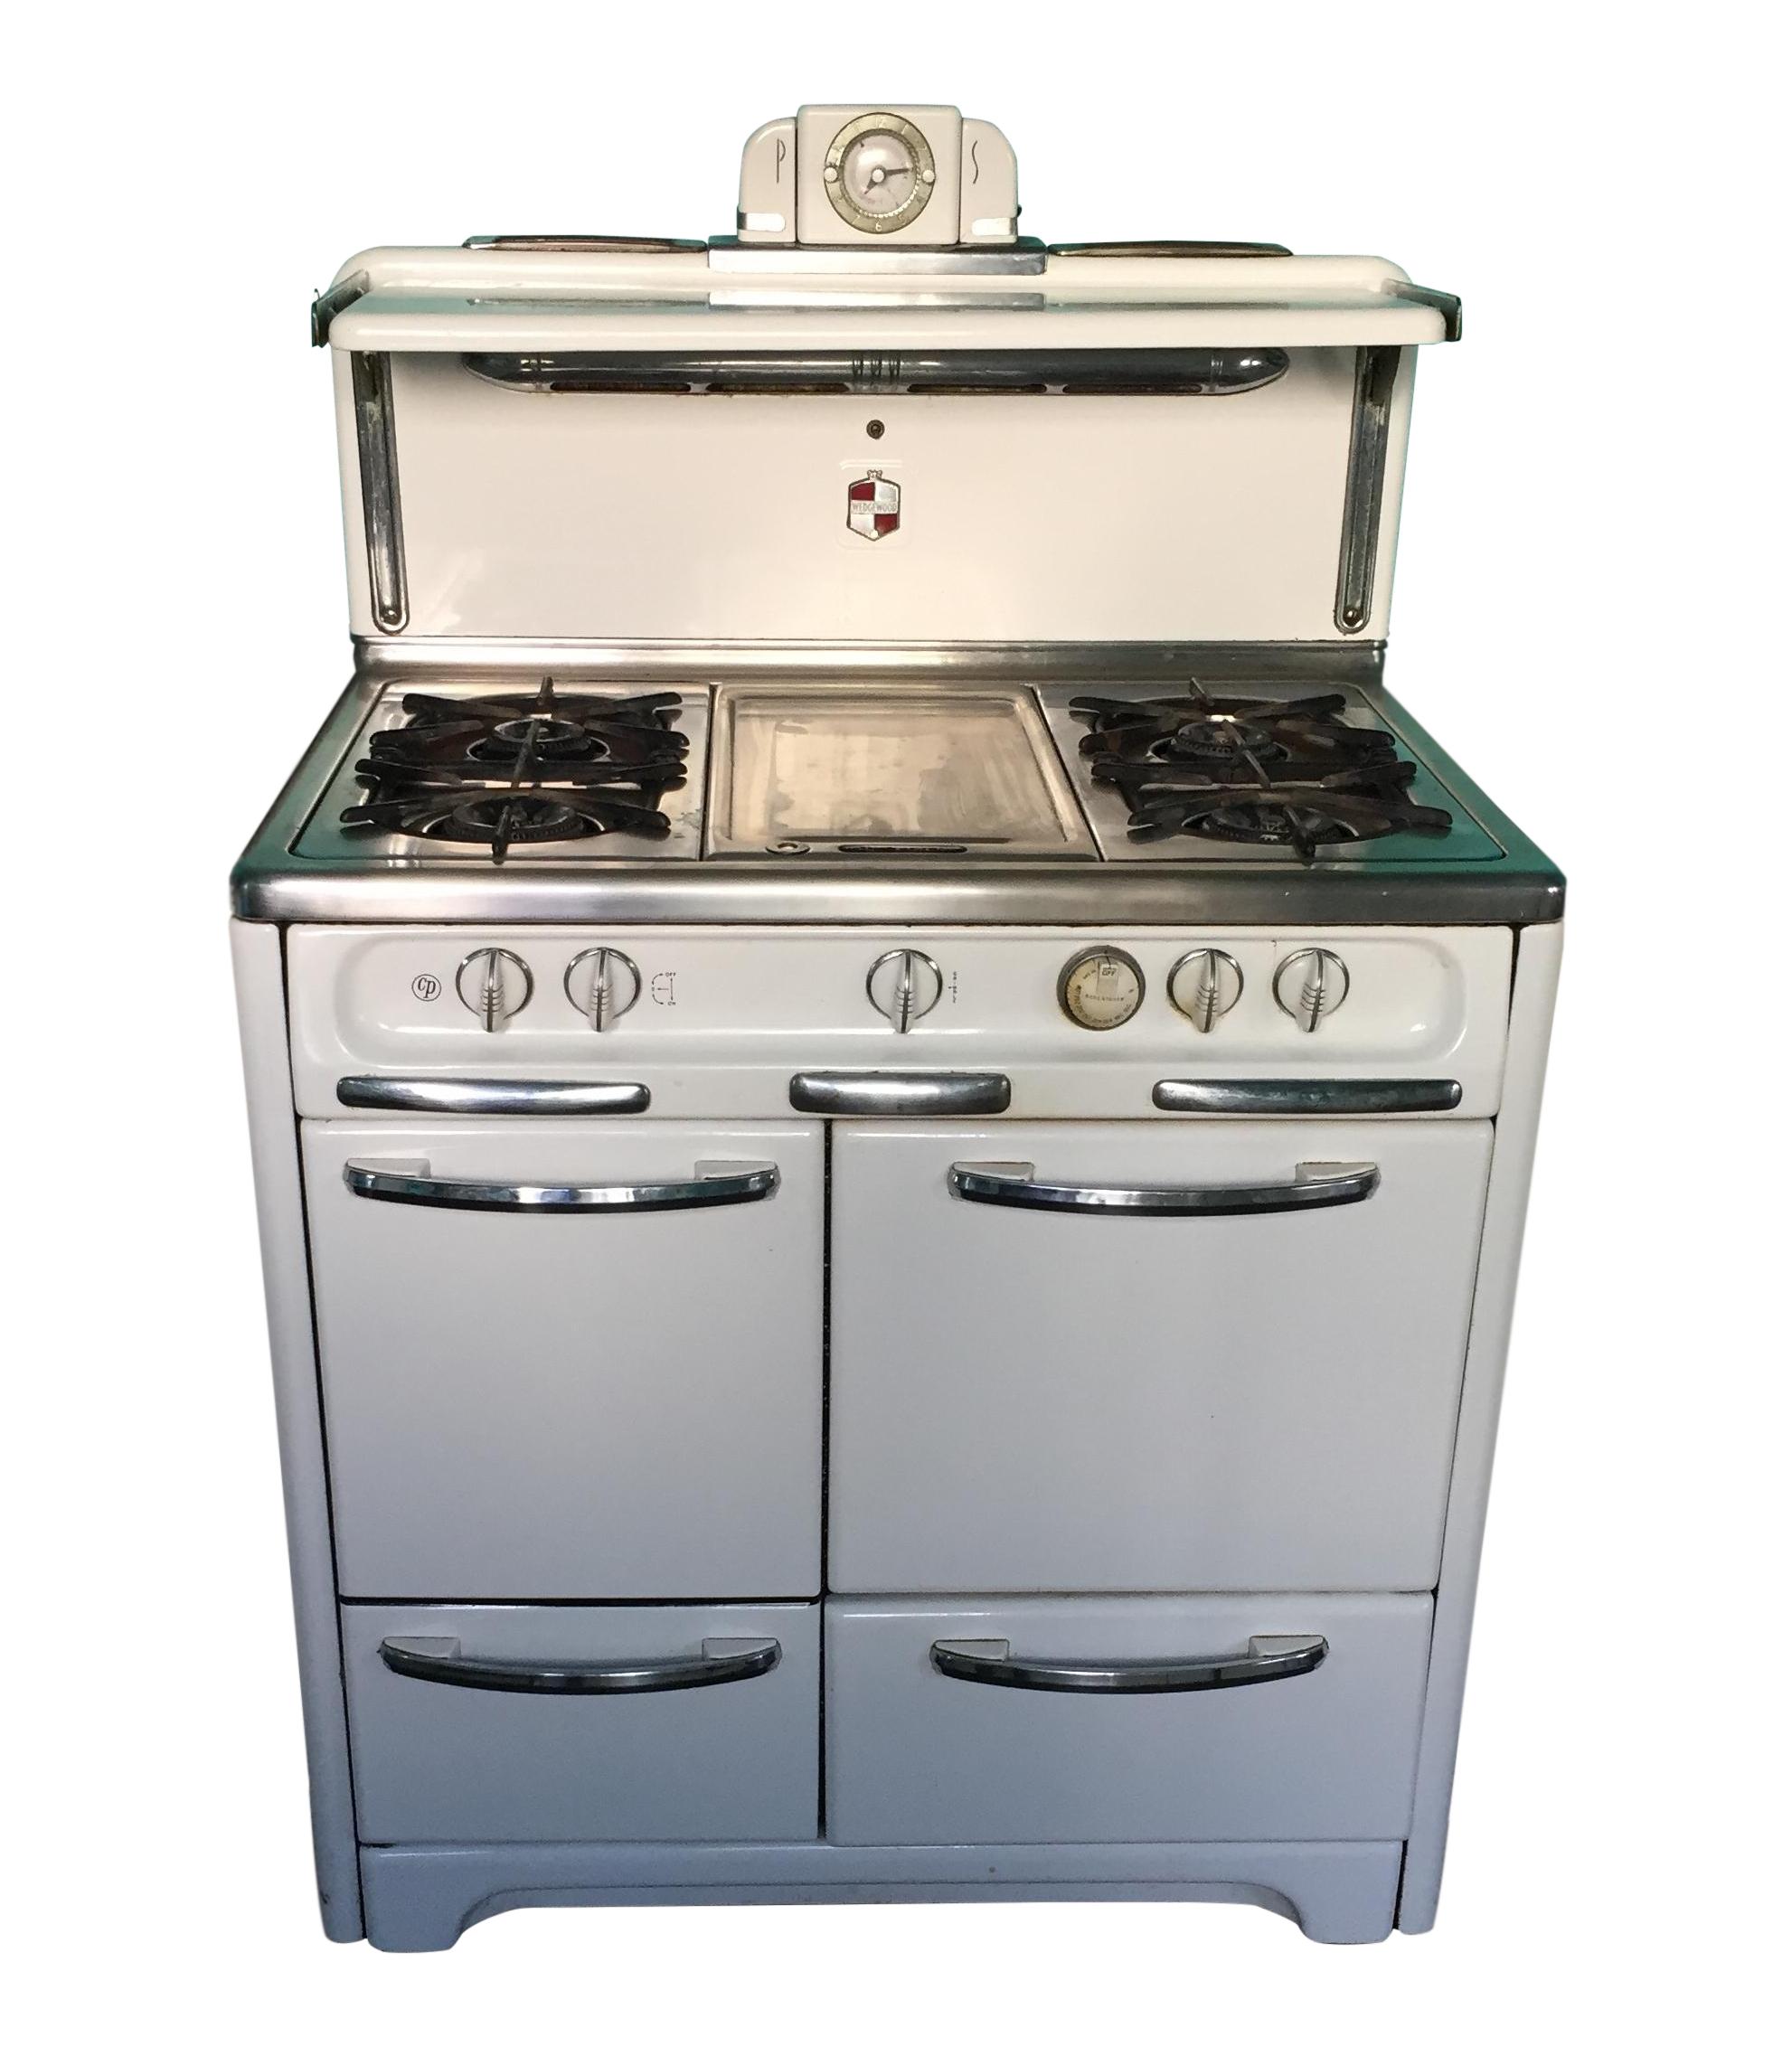 Dating wedgewood stove